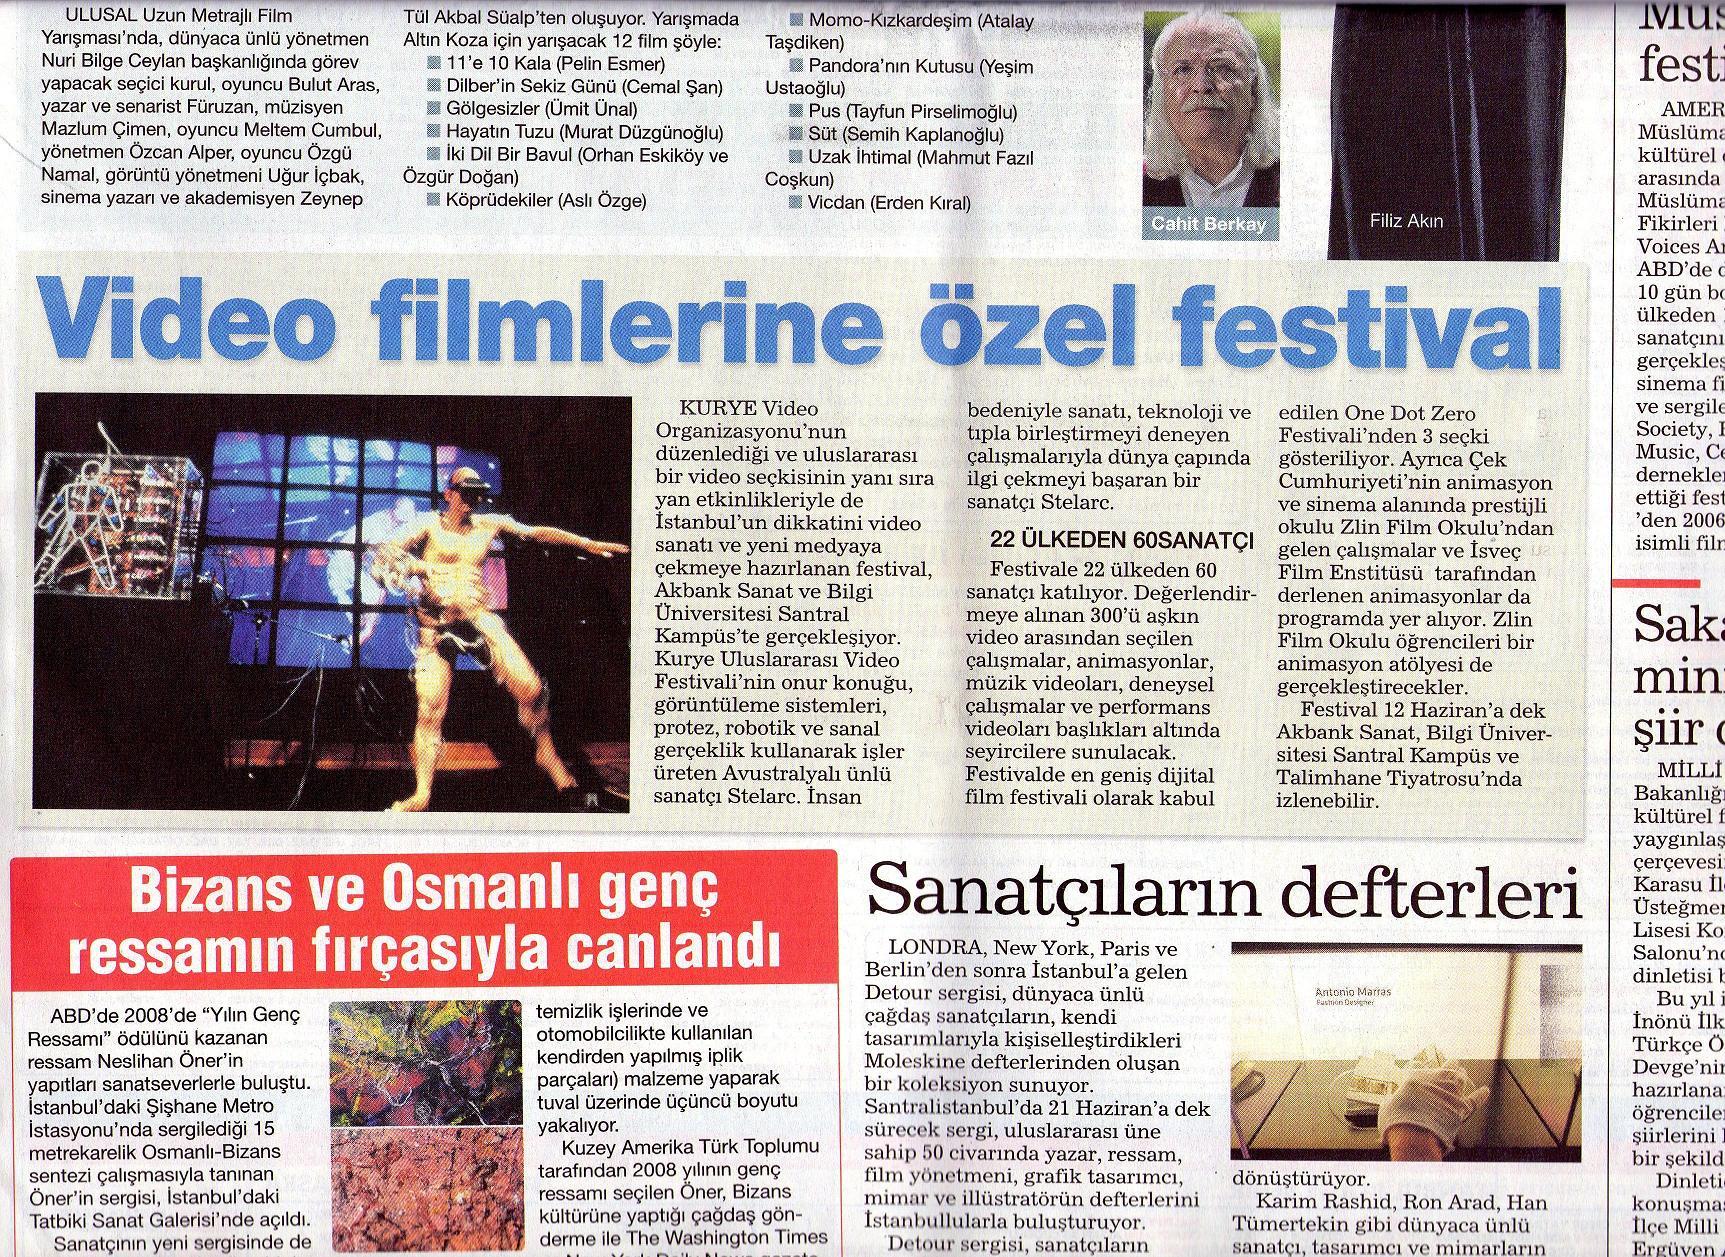 HaberTürk_08.06.09_haber.JPG